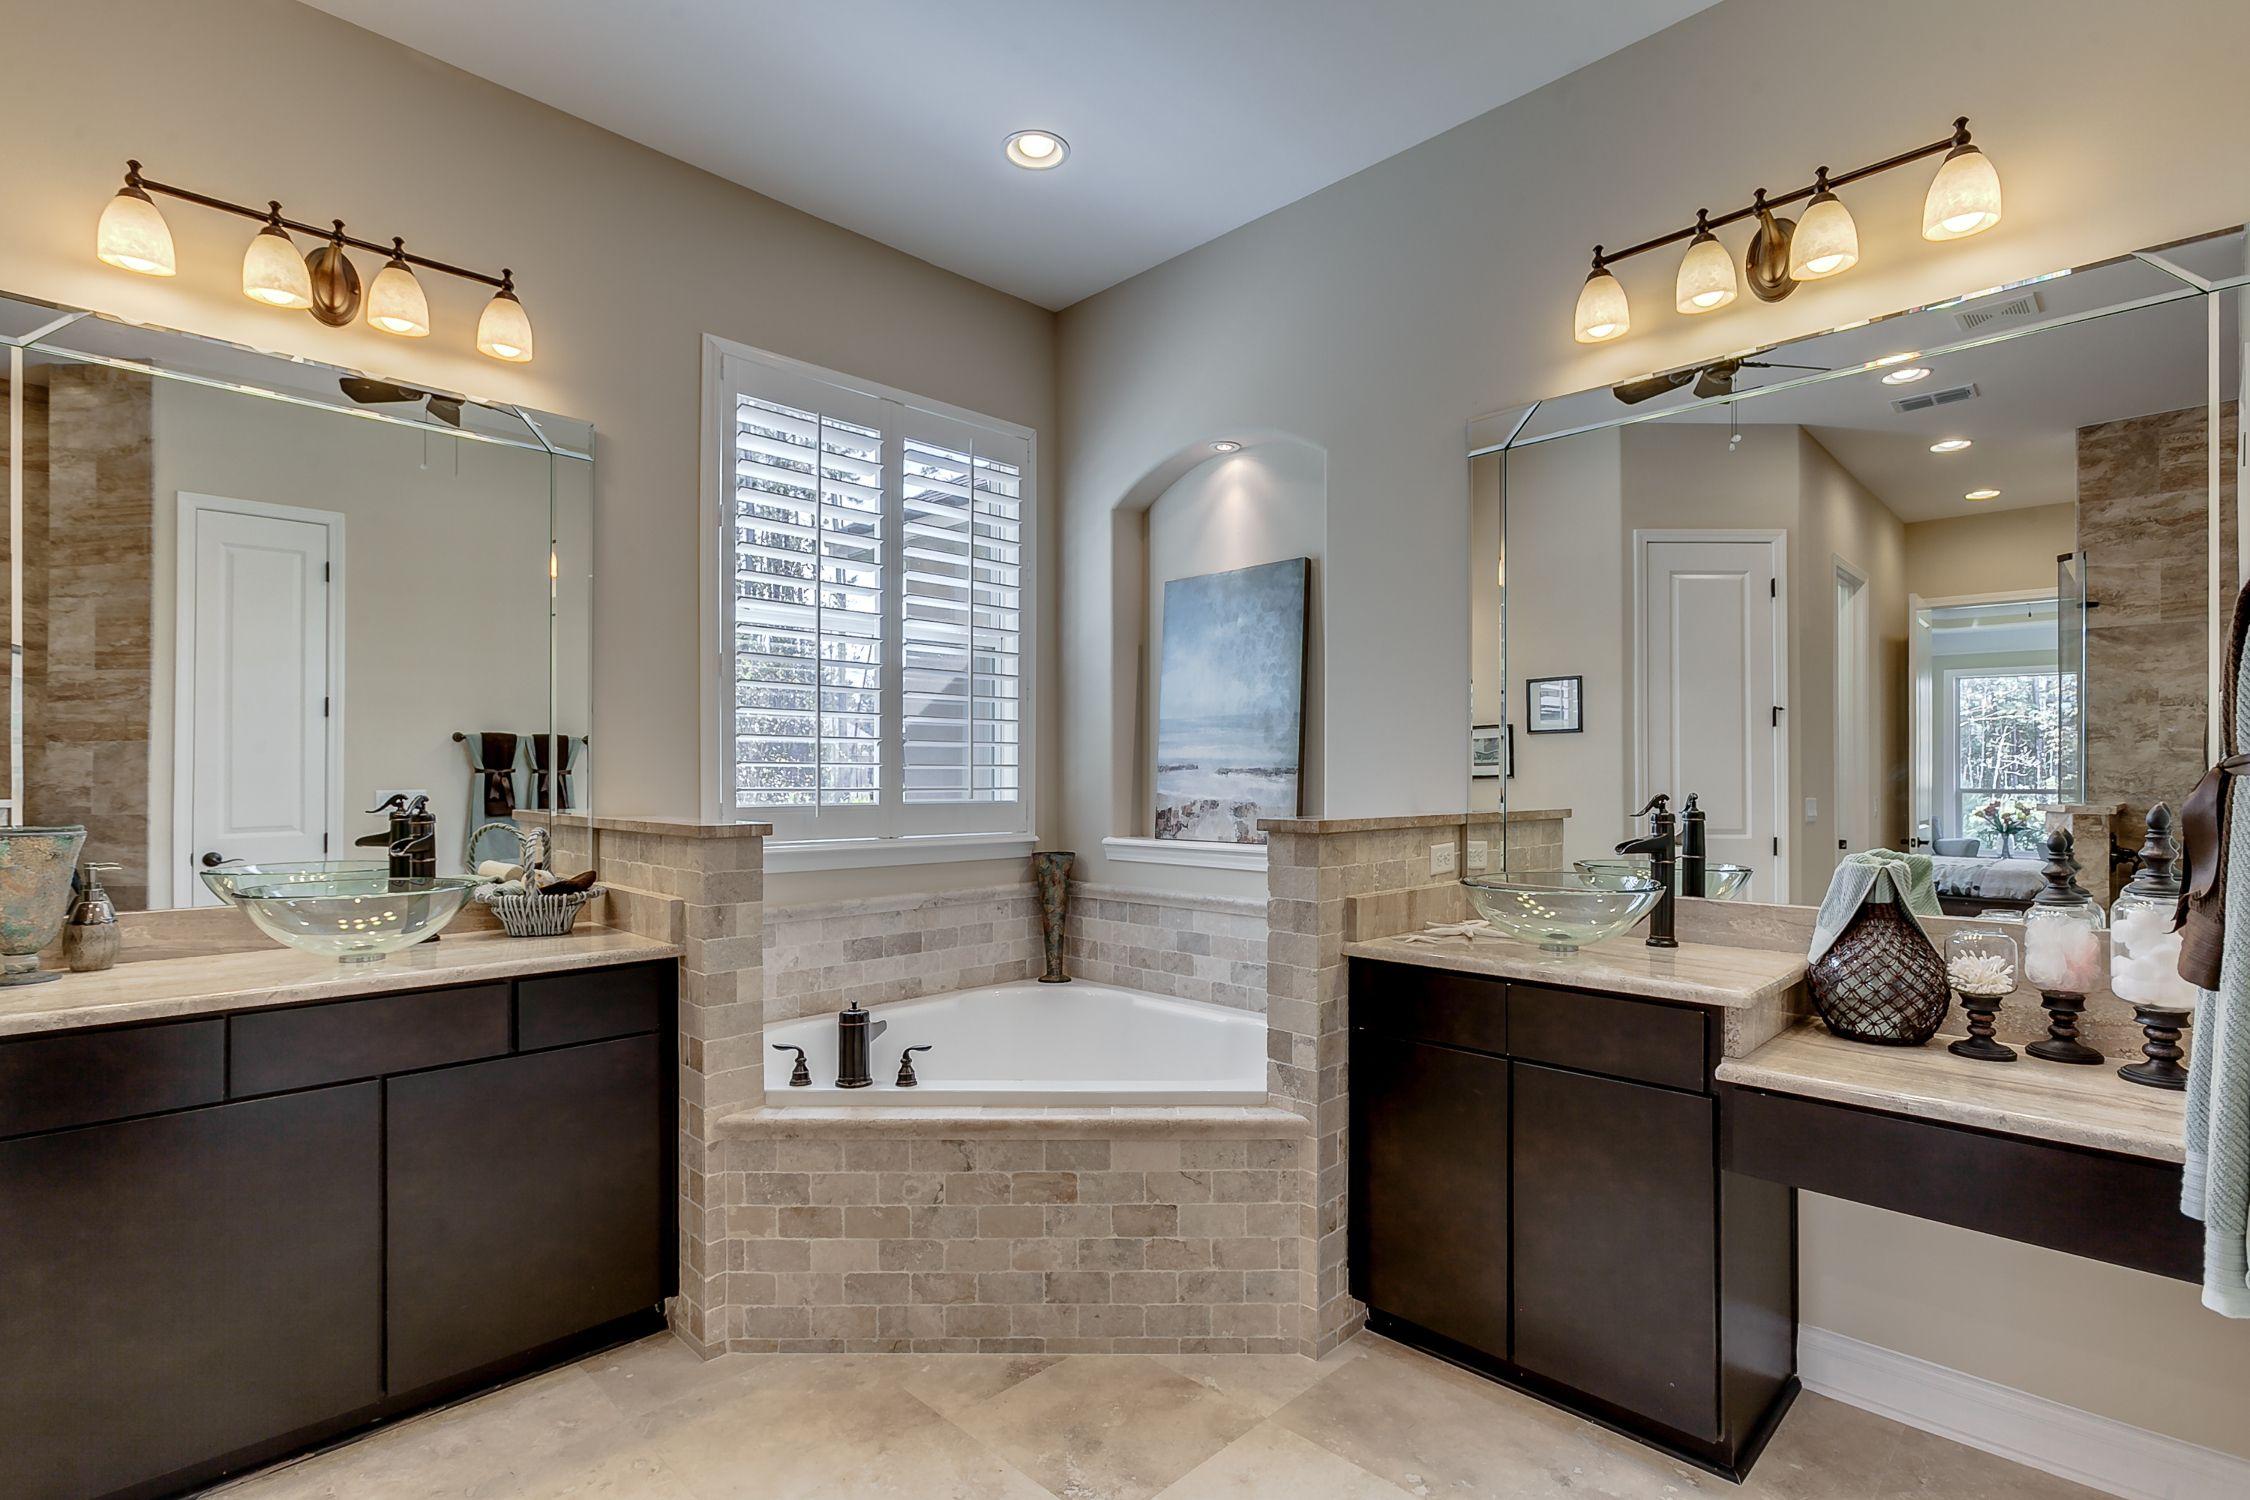 Model Home At Durbin Crossing Master Bathroom Absolutely